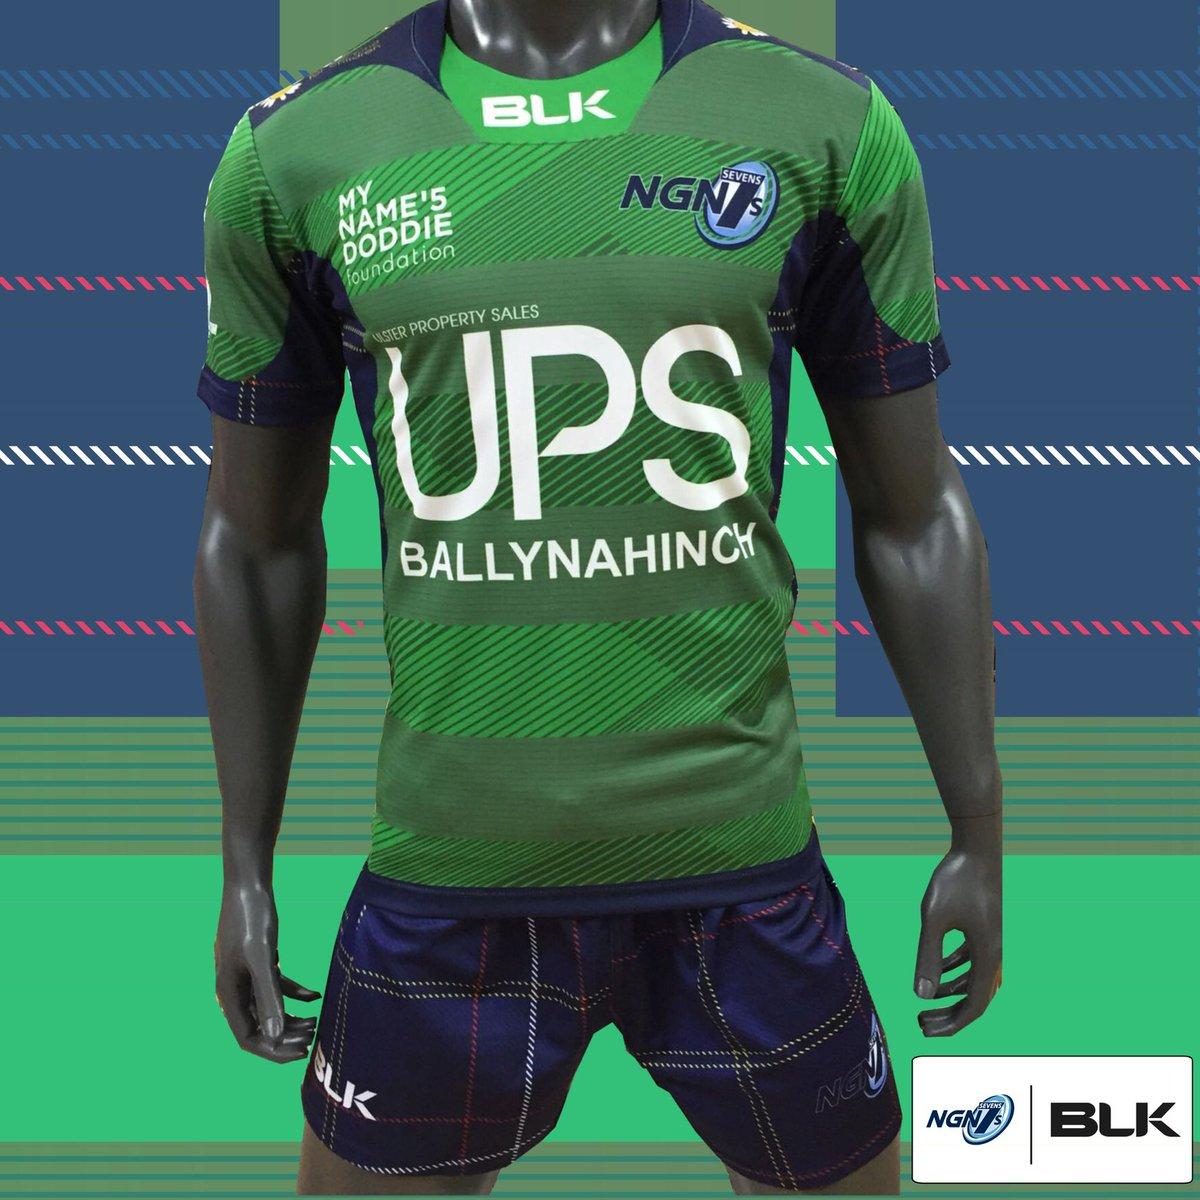 BLK Sport Ireland on Twitter: